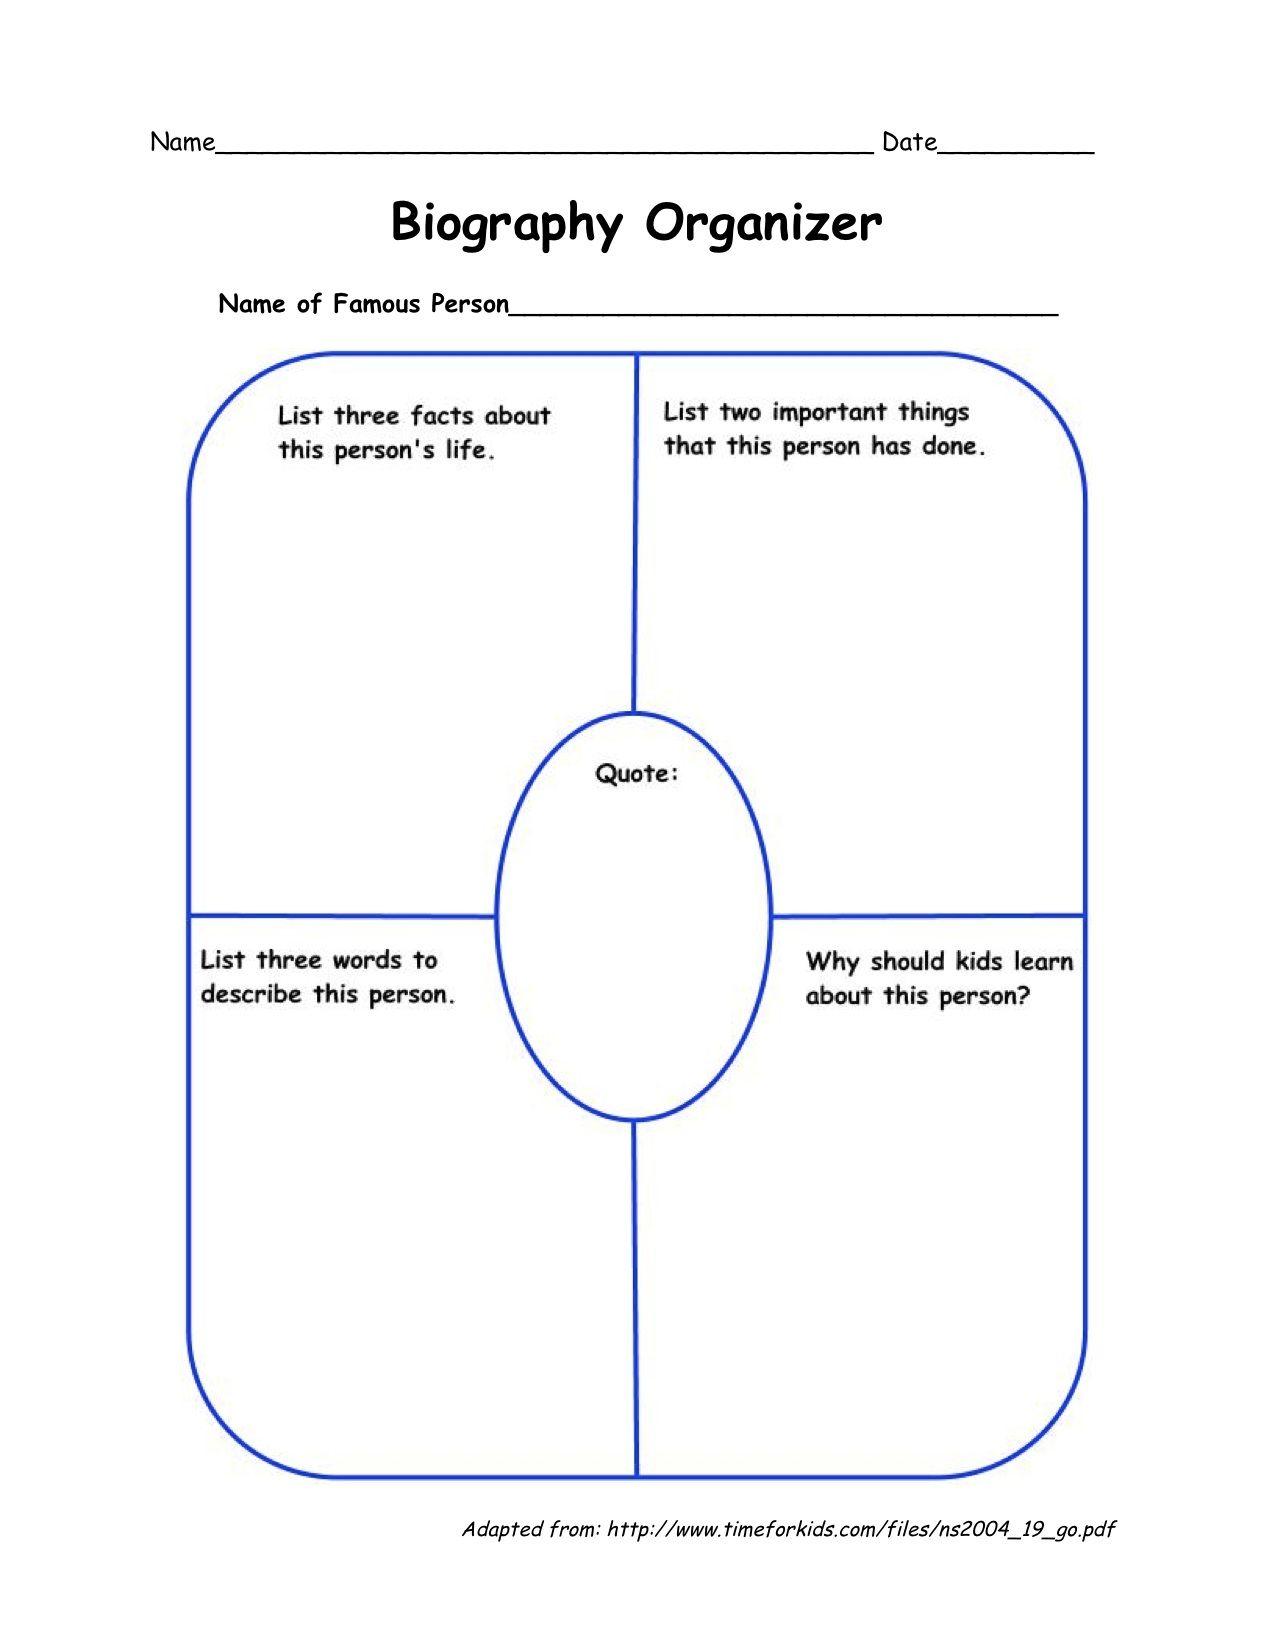 hight resolution of templatebiographyorganizer-1.jpg (1275×1651)   Second grade writing